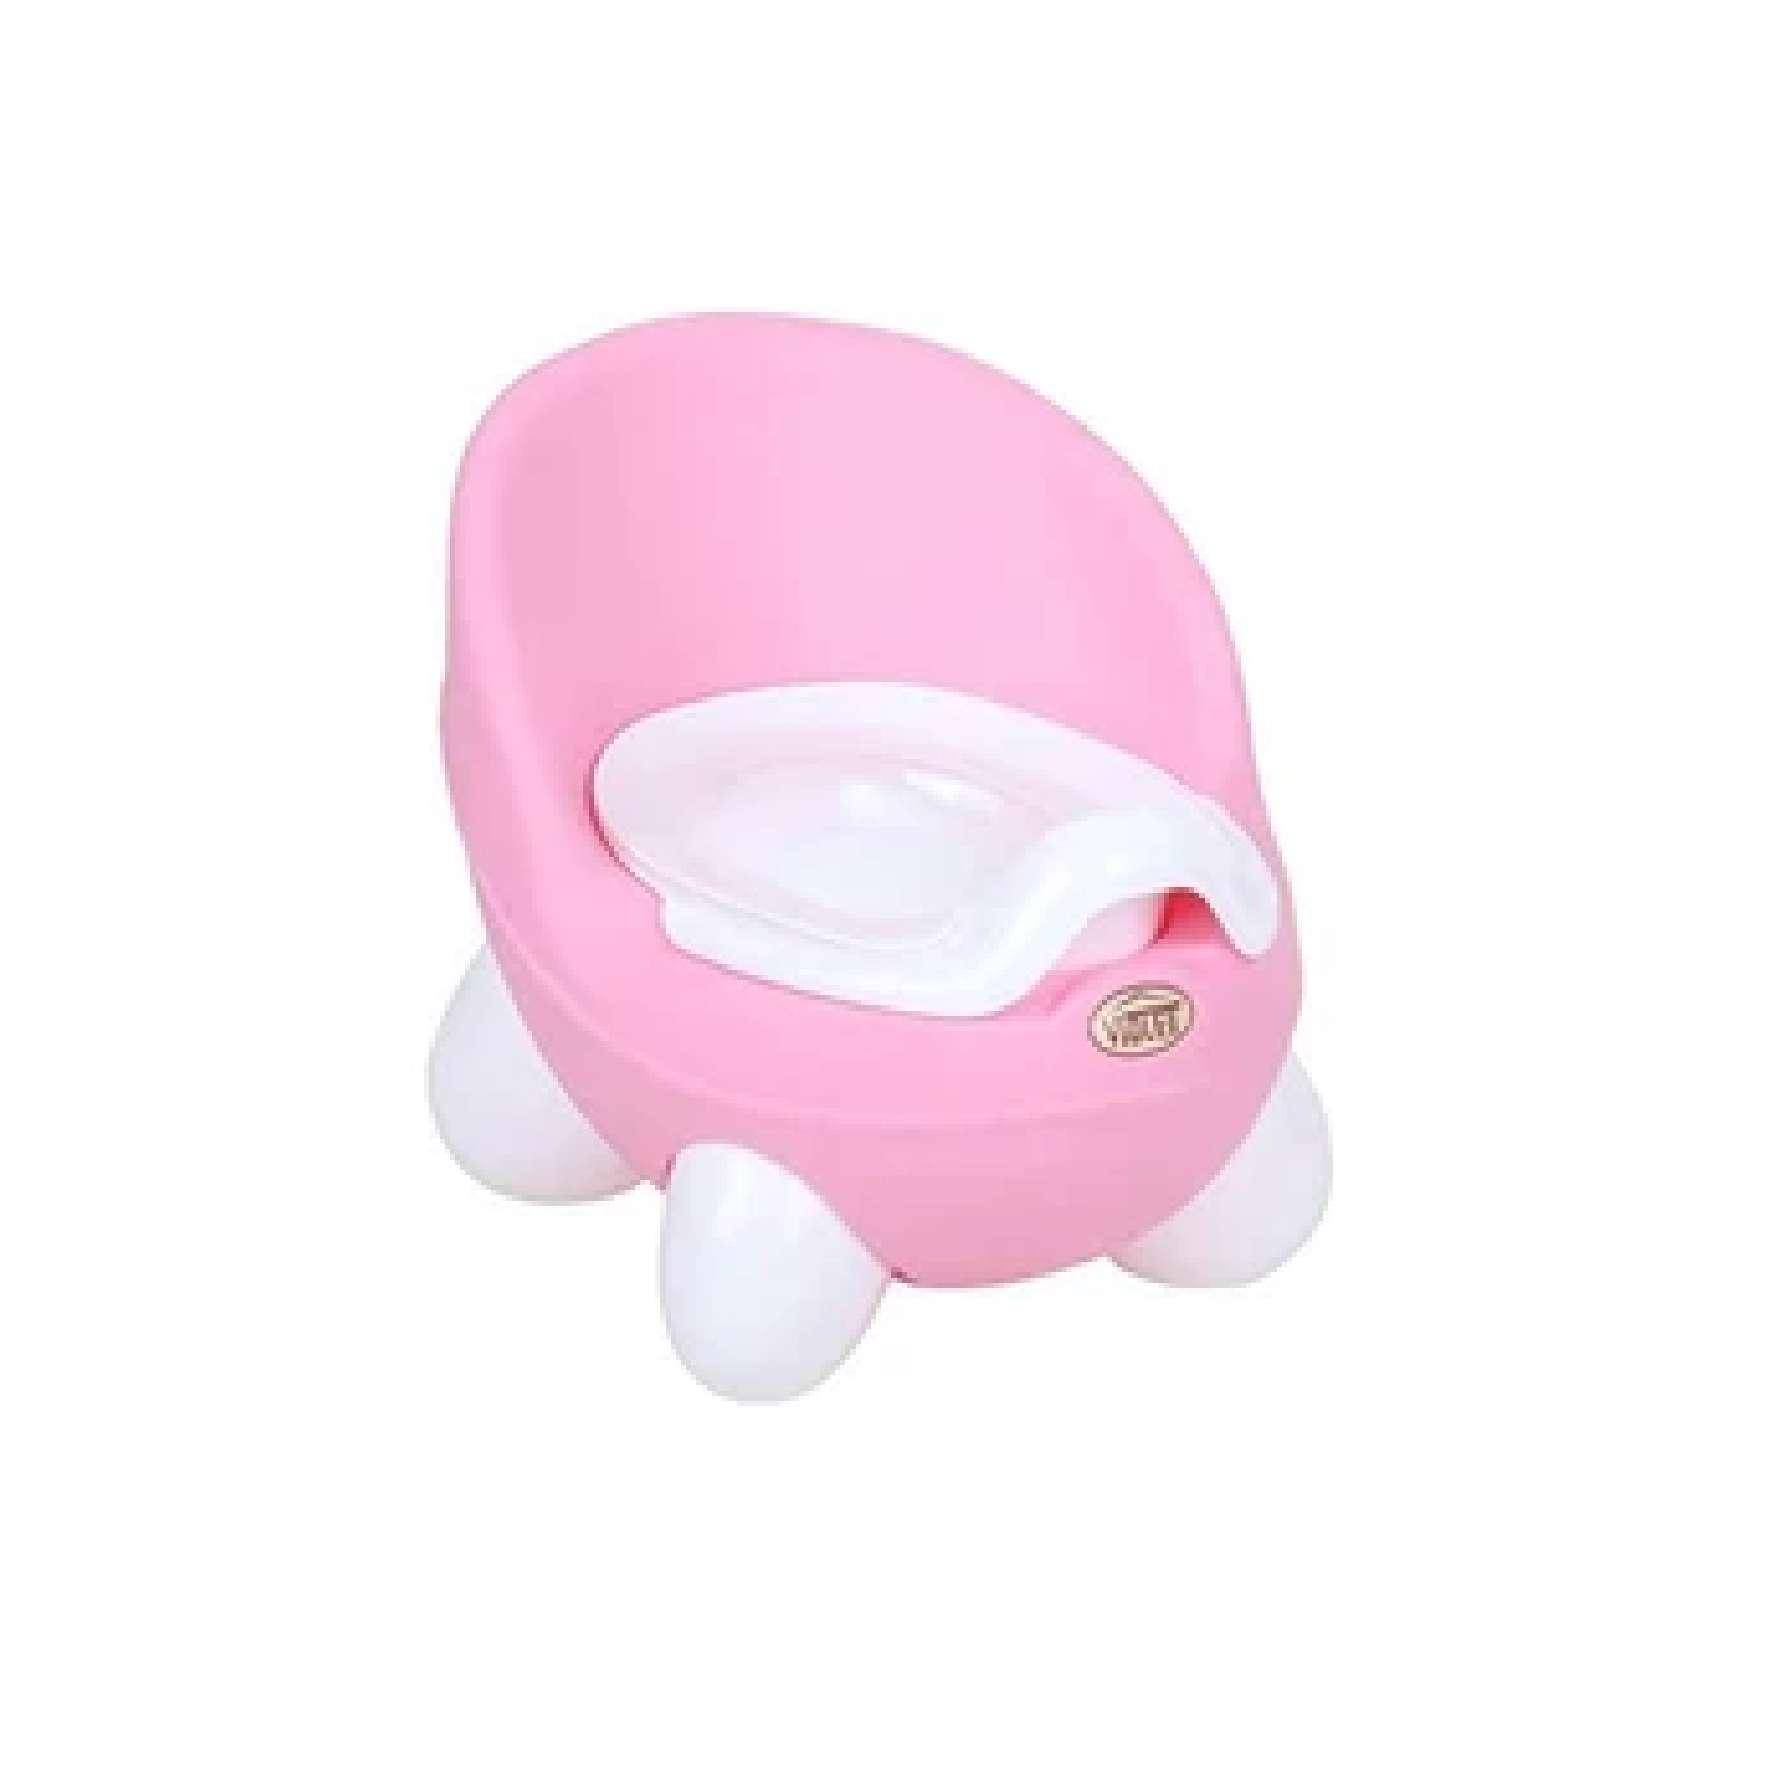 Panda Style Baby Potty Training Chair Easy Potty Pink/Blue 27 x 20cm K0084